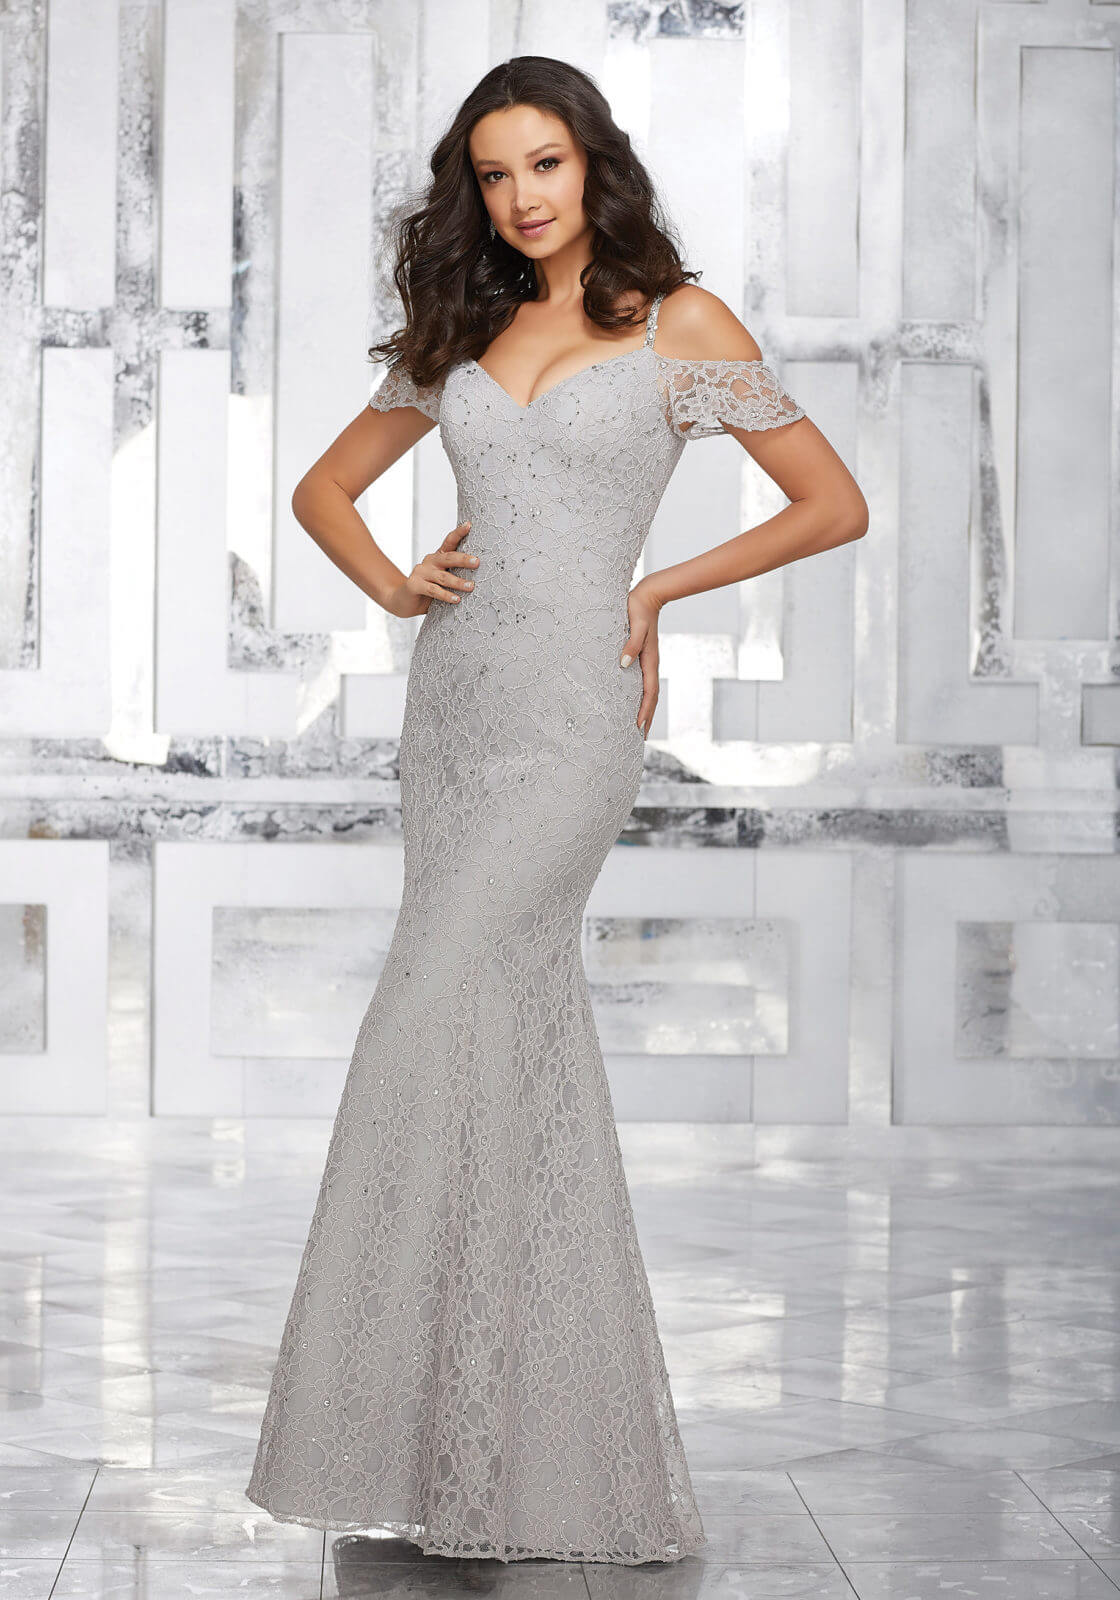 Bridesmaid dresses perth wa bridesmaid gowns perth bridesmaid 21531 ombrellifo Choice Image